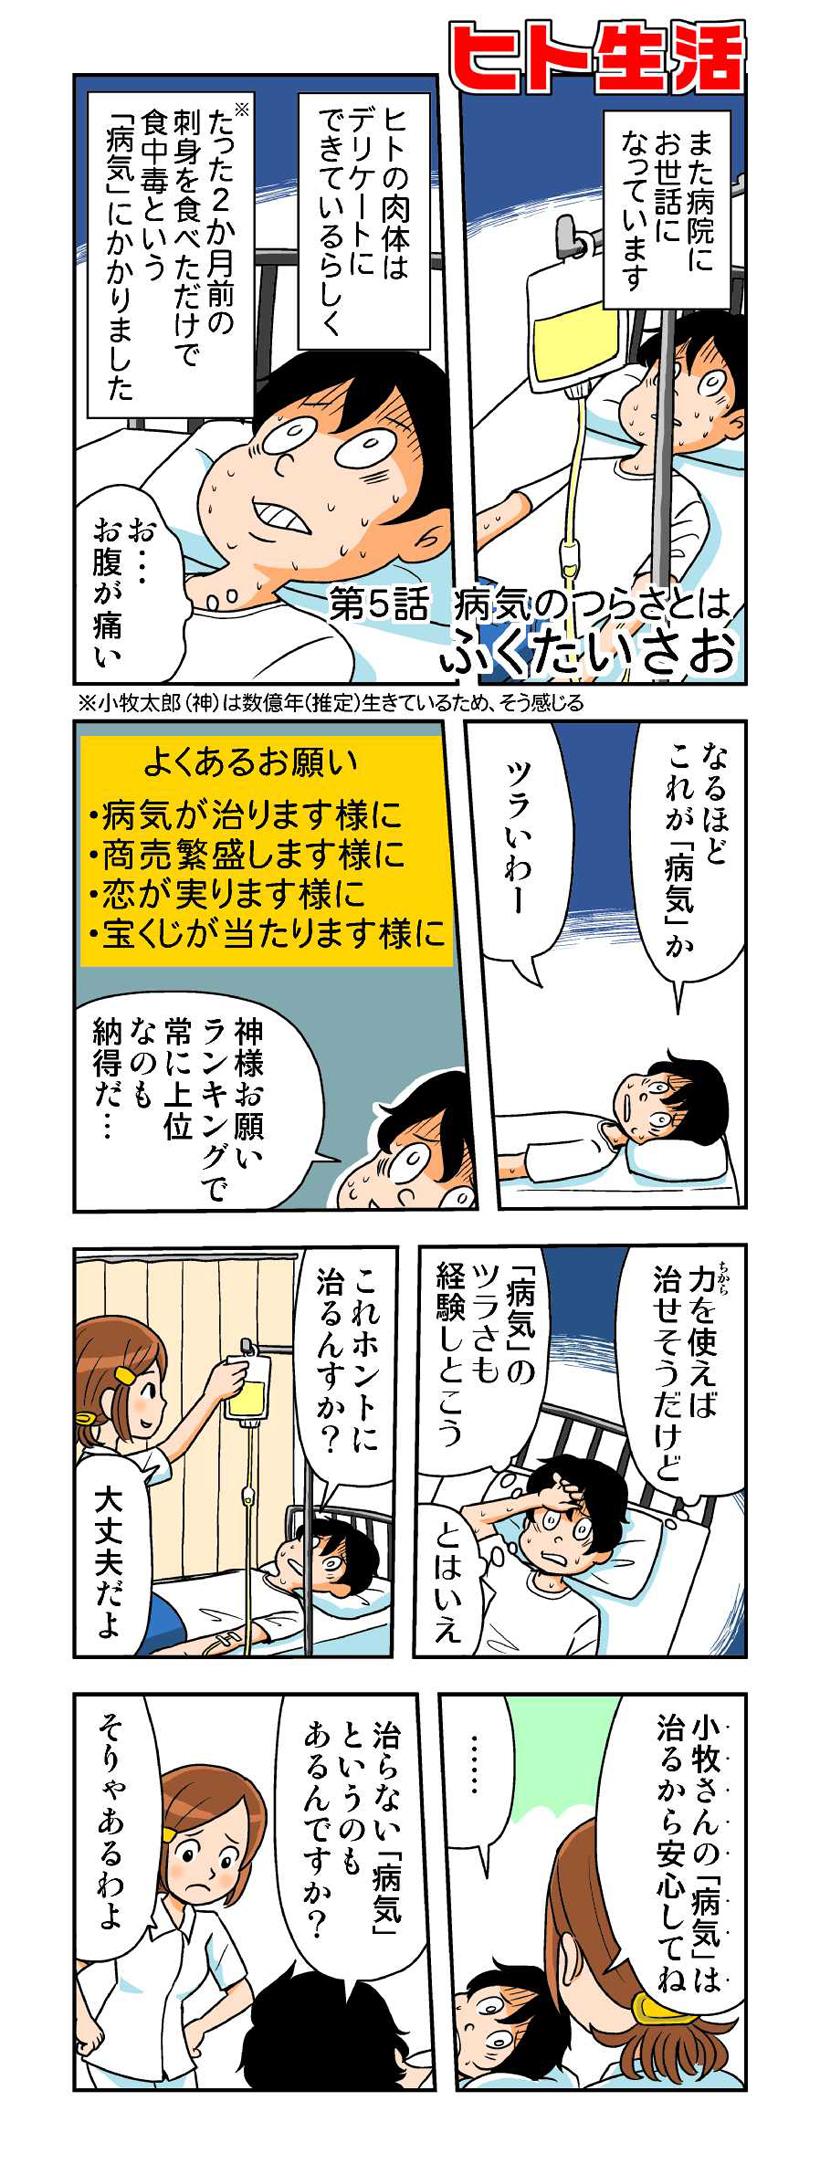 20160524_01